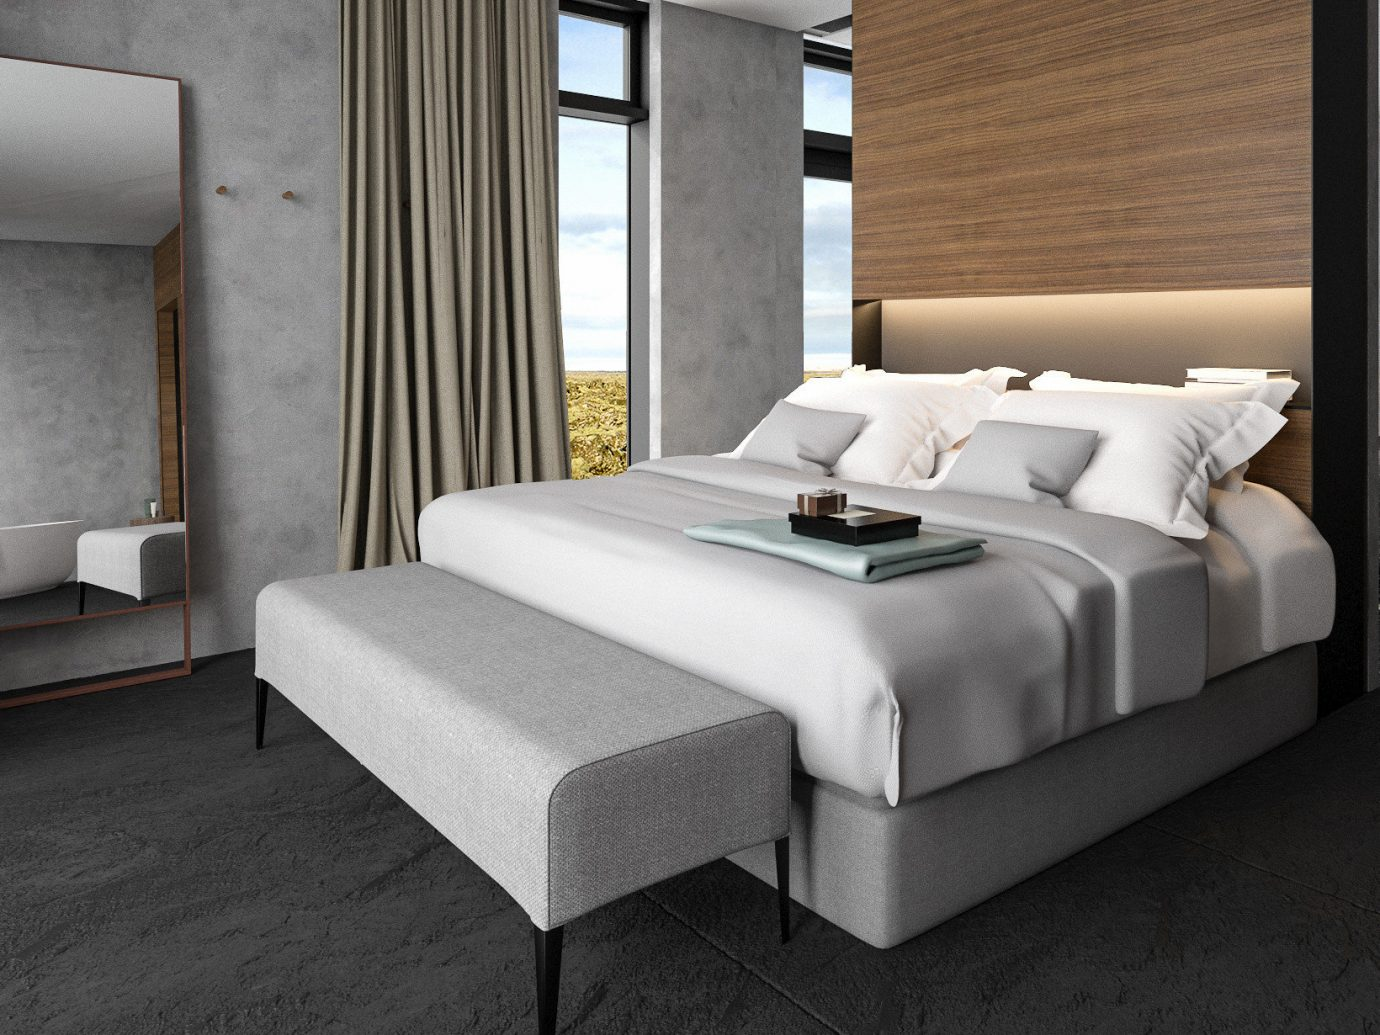 europe Hotels Iceland Trip Ideas floor indoor bed frame bed room furniture Suite Bedroom interior design wall mattress hotel flooring product design box spring comfort interior designer